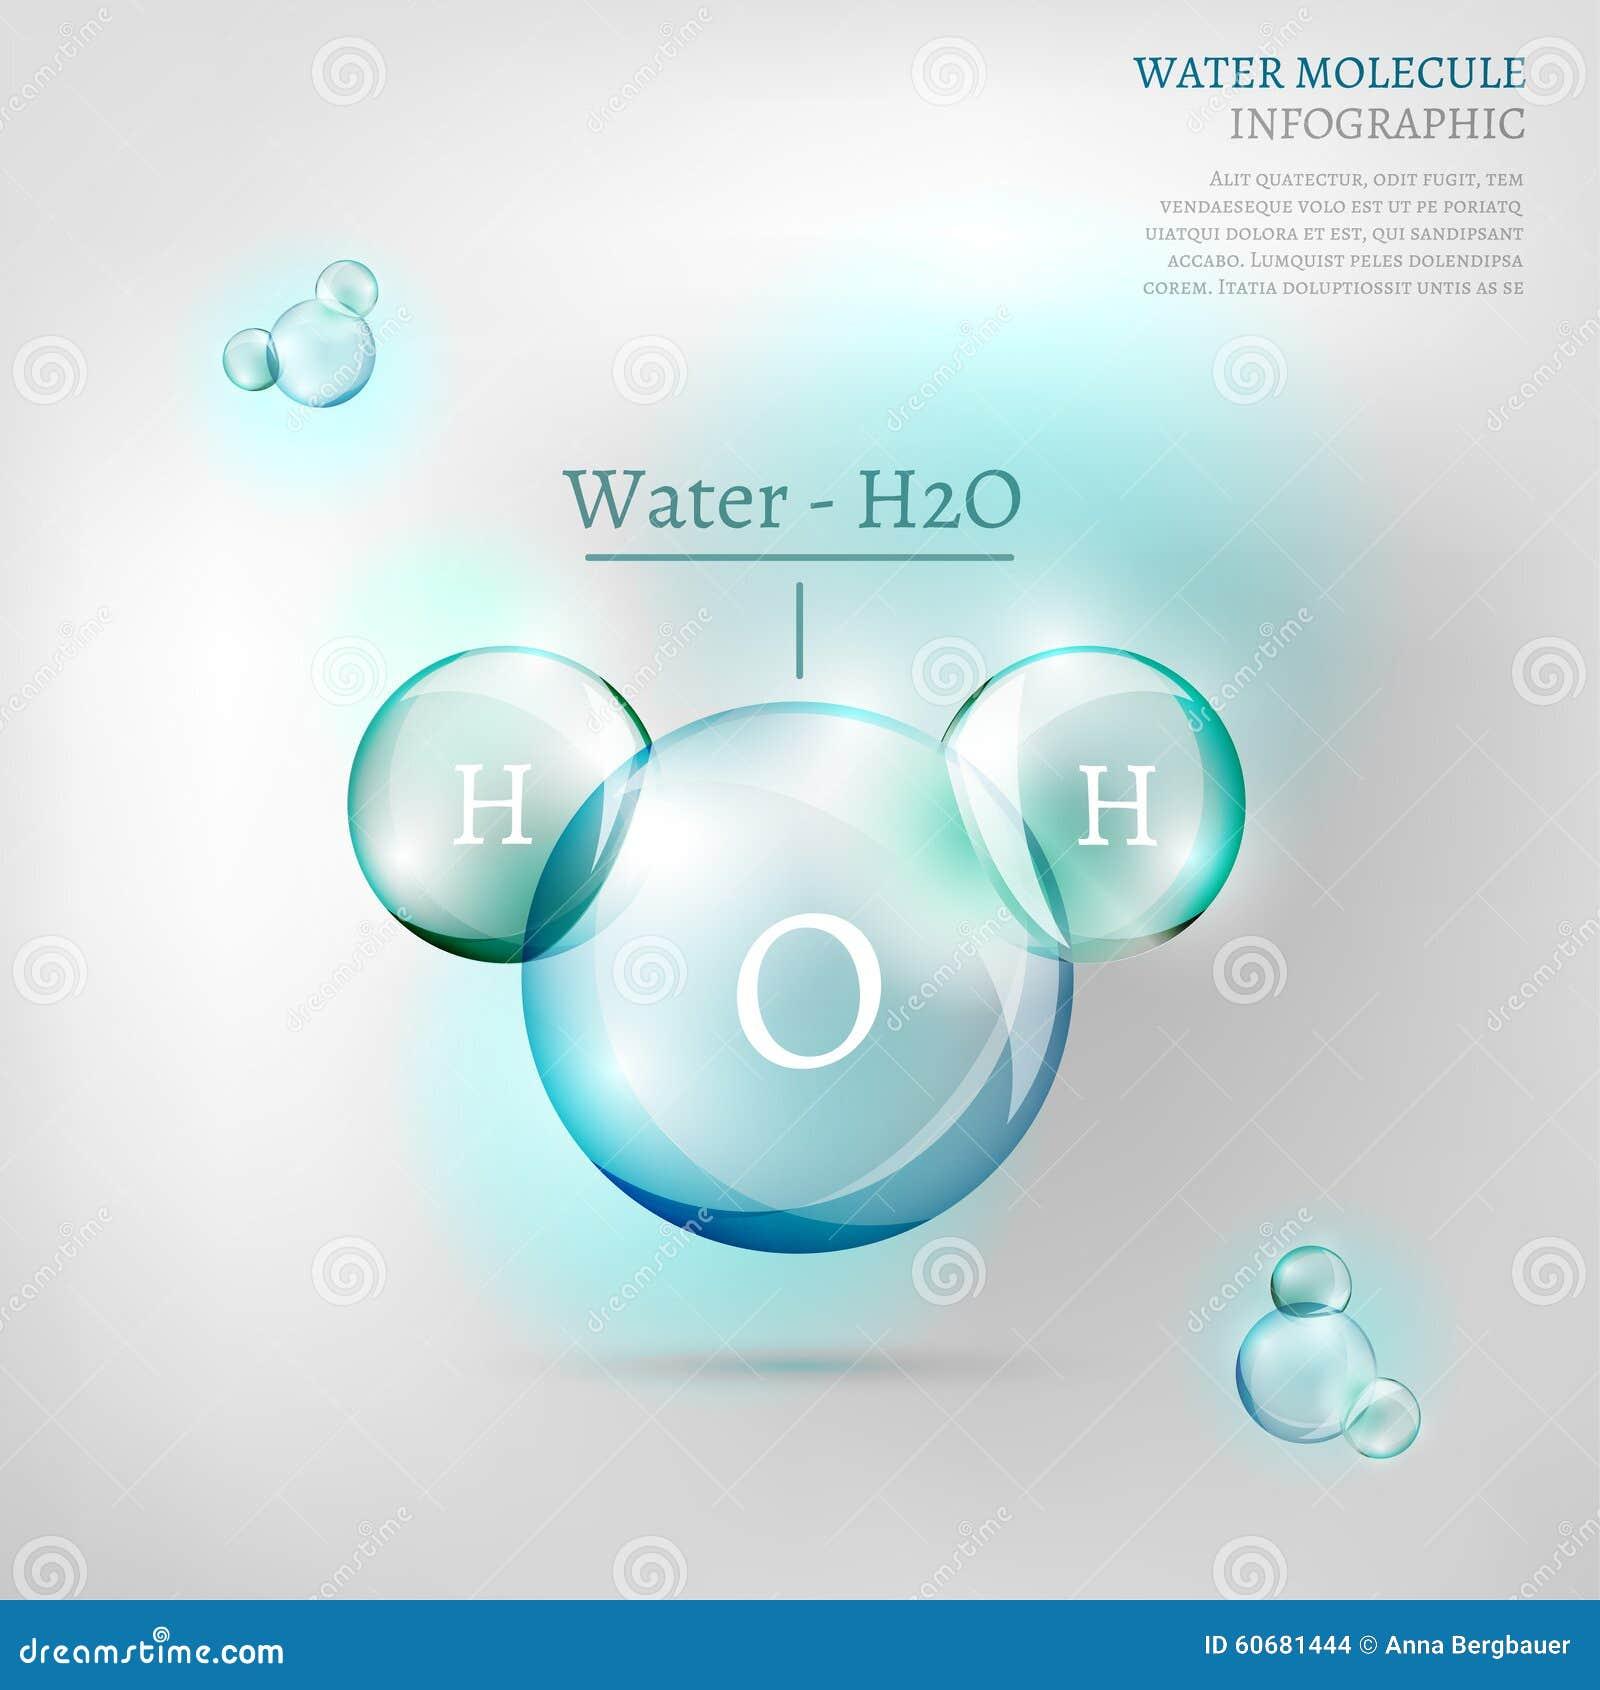 Water Molecule Stock Vector Illustration Of Bubble Background Diagram